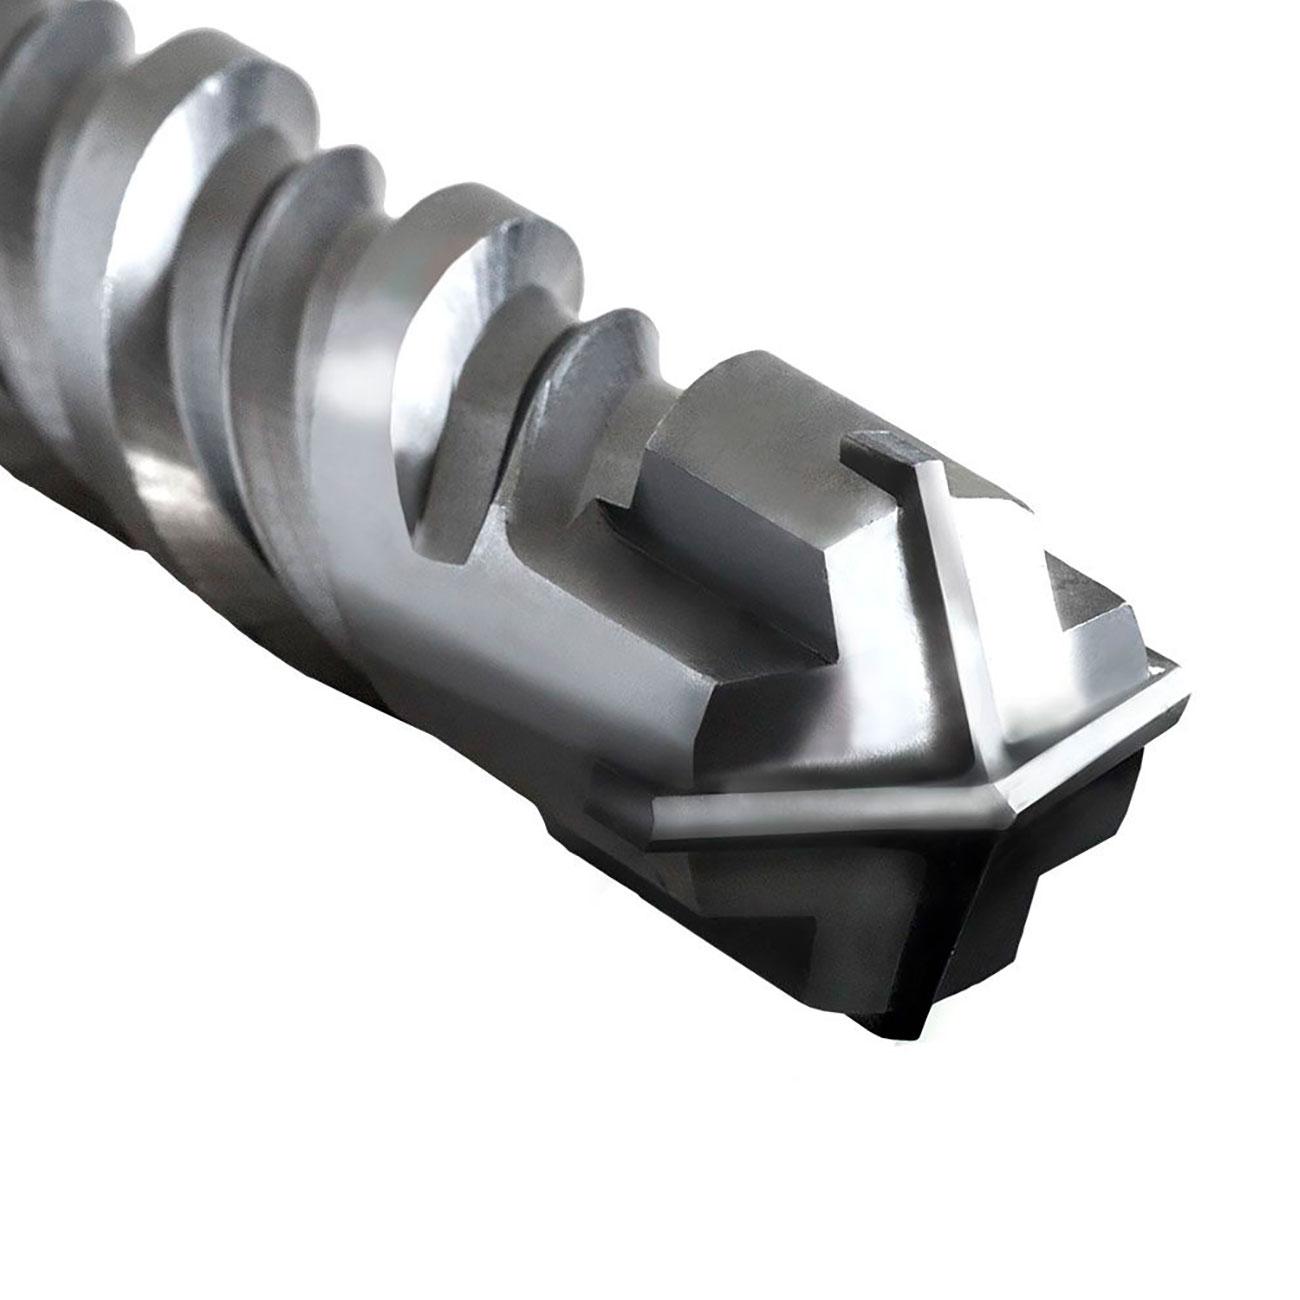 Фото Бур Квадро по бетону SDS-MAX, 18 х 340 мм, Практика Эксперт {647-864} (1)